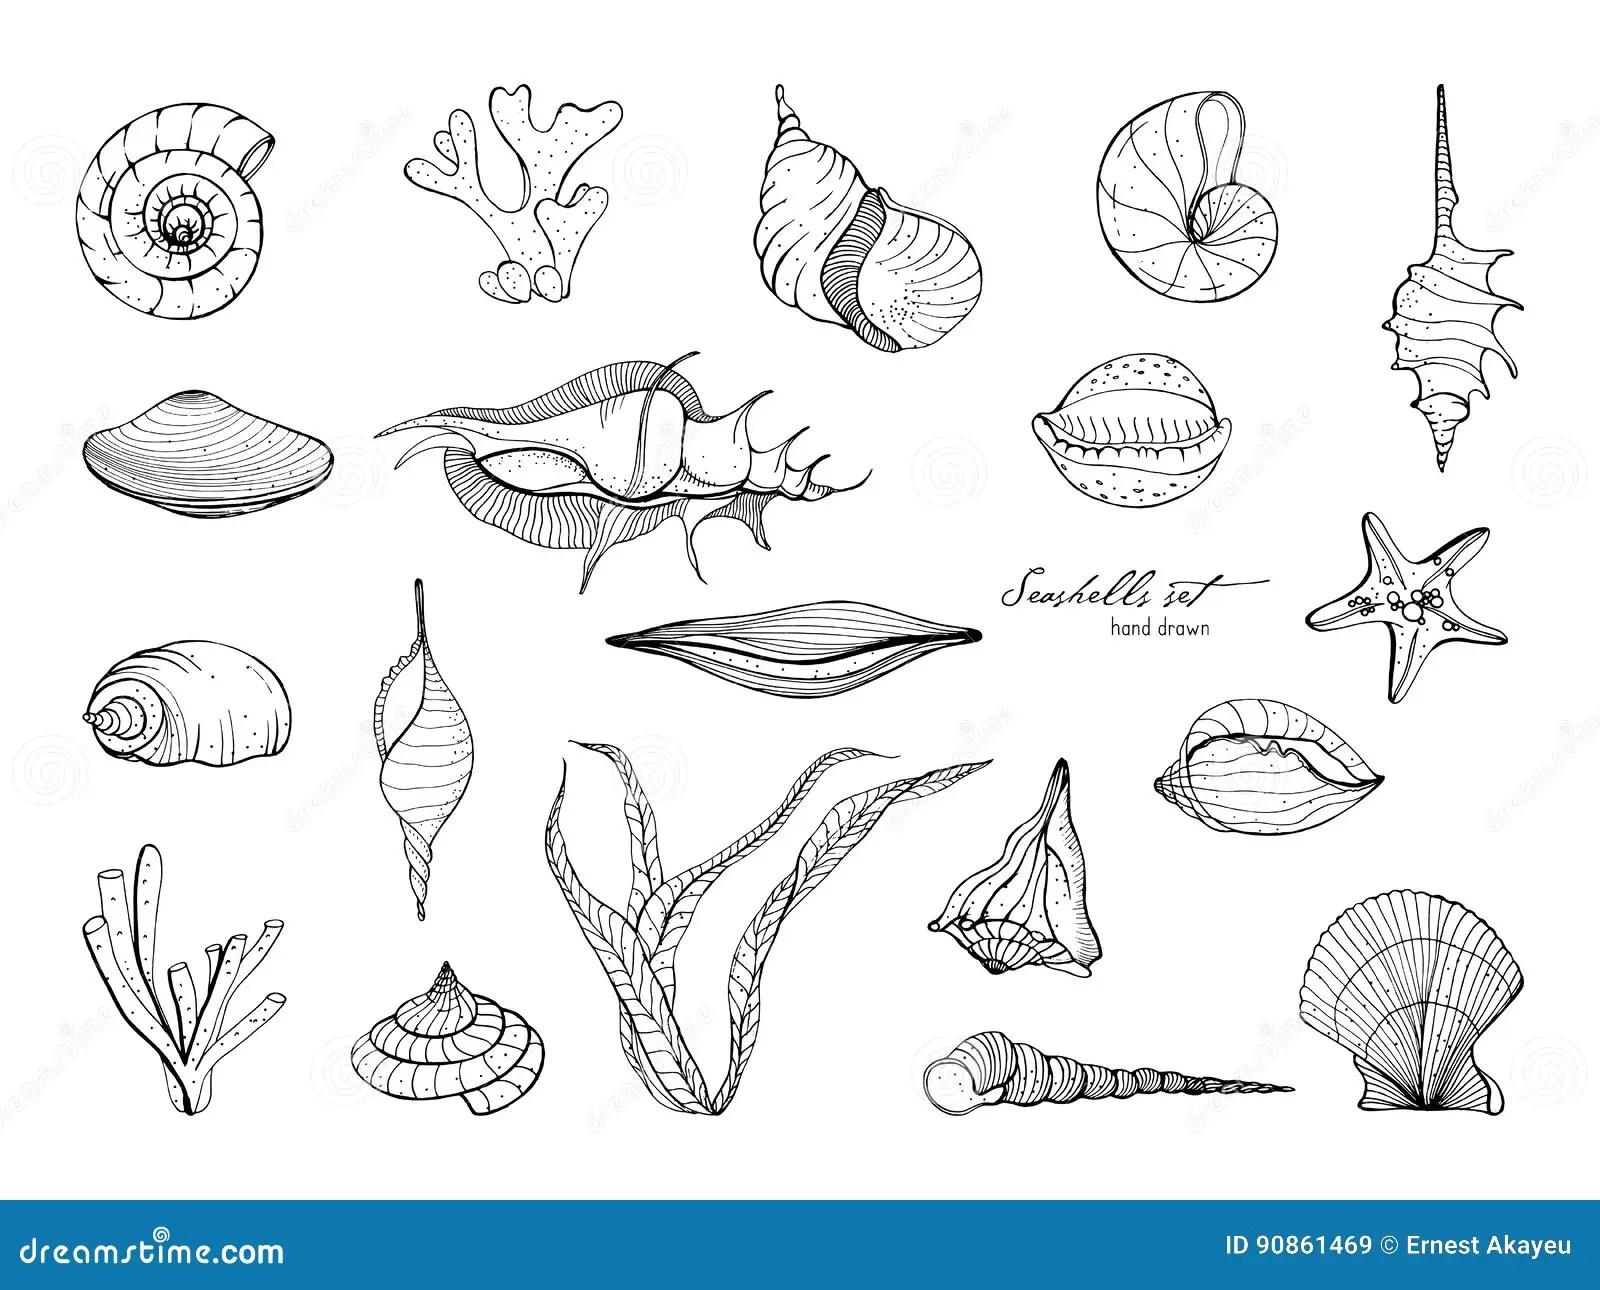 Hand Drawn Seashells Collection Set Of Seaweed Coral